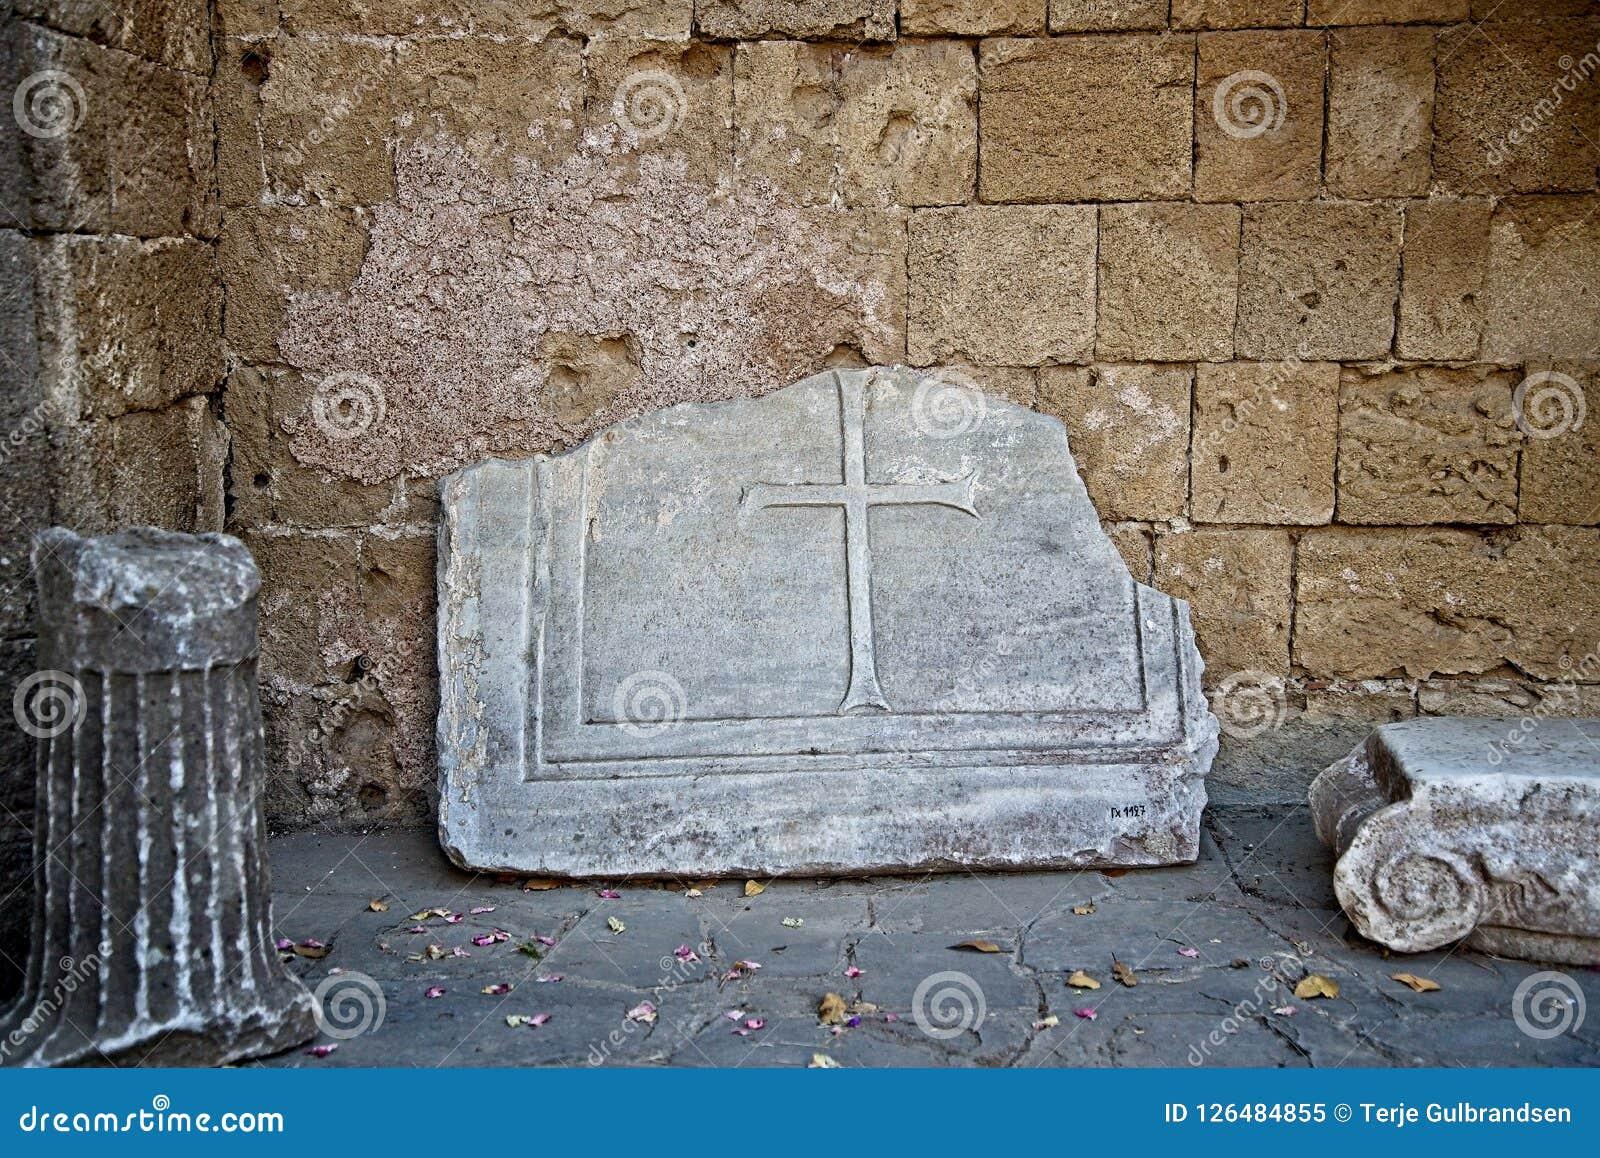 Broken stone cross found in Acropolis of Ialysos near the temple.